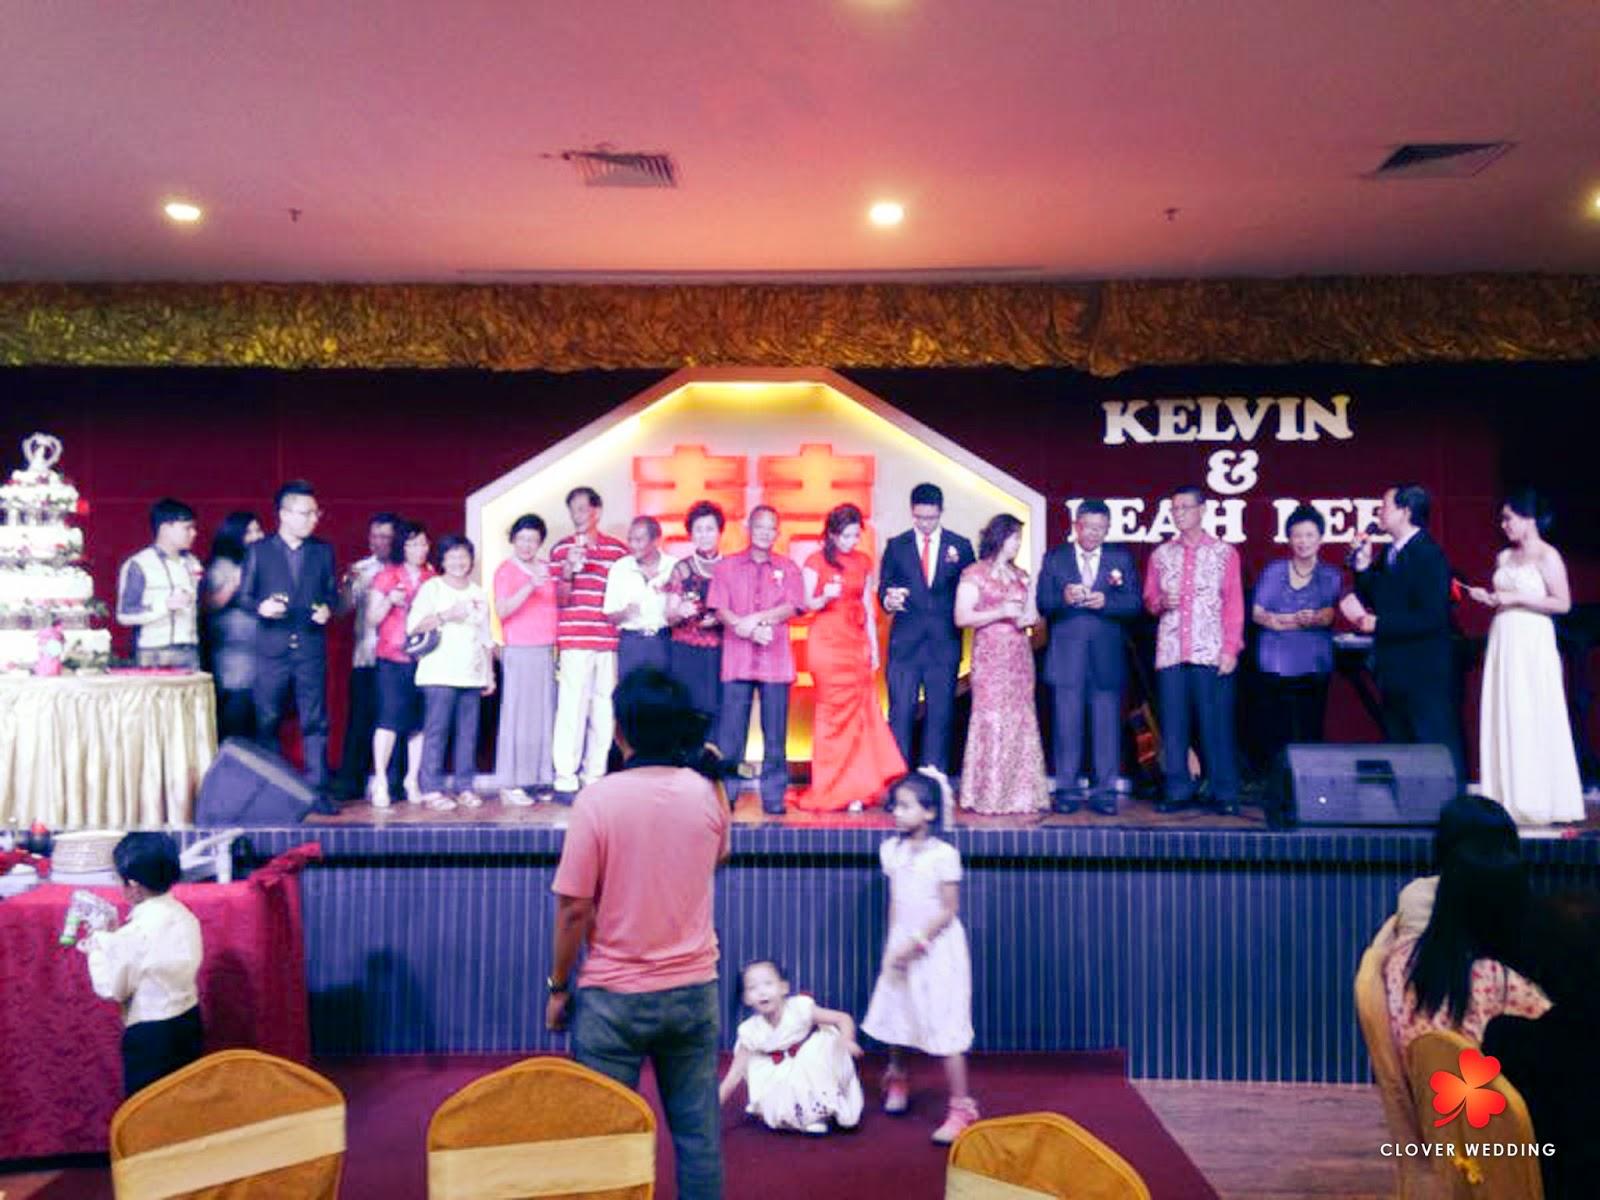 Clover wedding kelvin tan leah lee wedding dinner kelvin tan leah lee wedding dinner sin choi wah kepong junglespirit Images